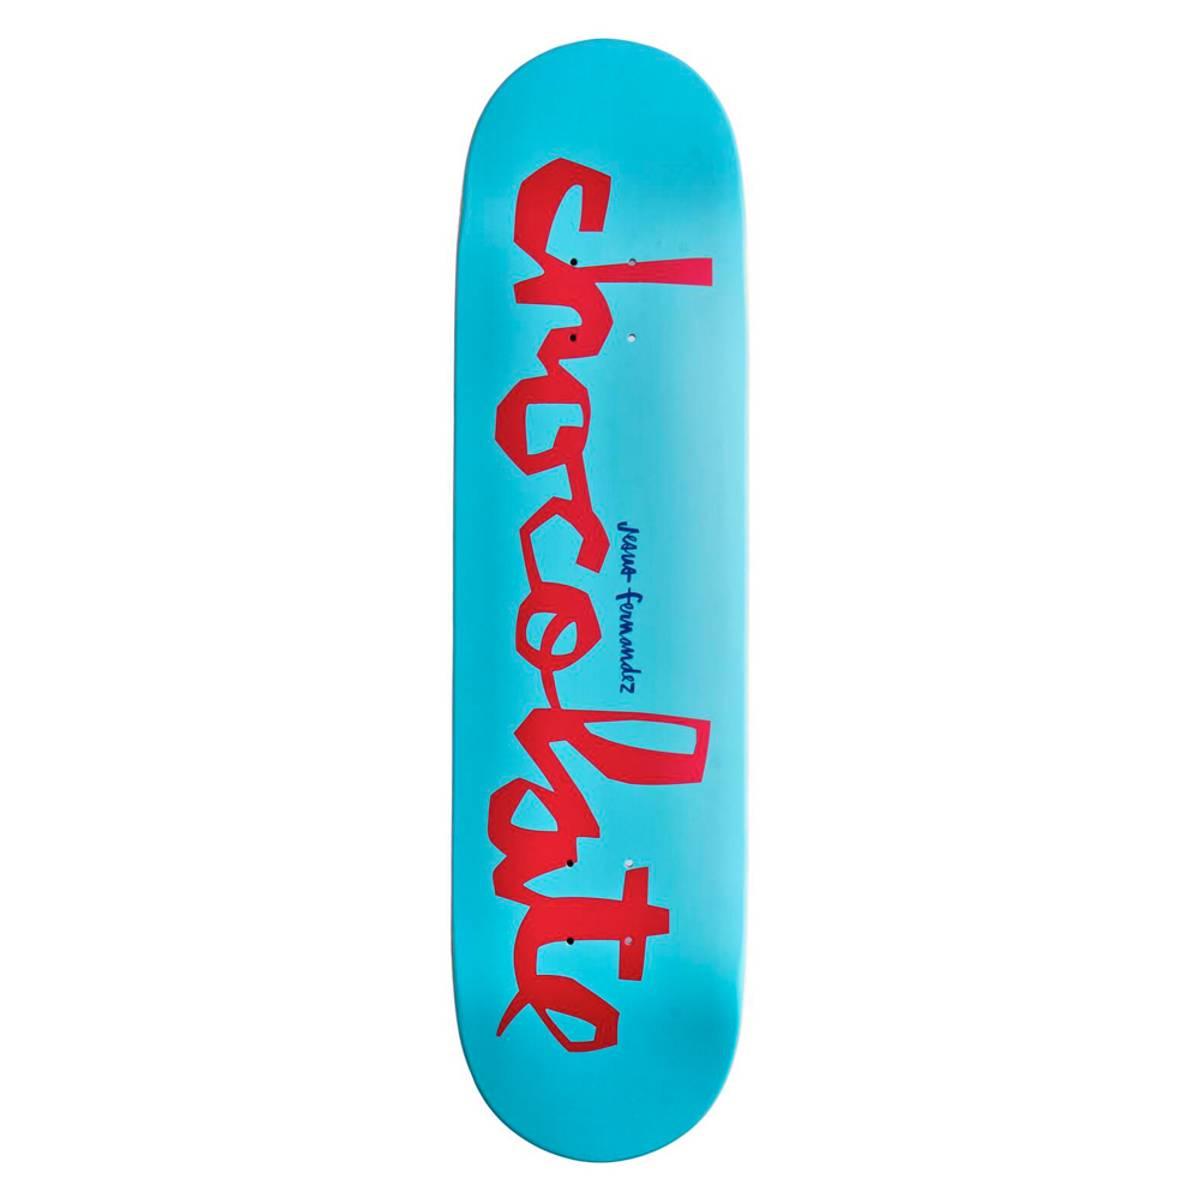 8.375 Chocolate - OG Chunk Fernandez Skateboard deck